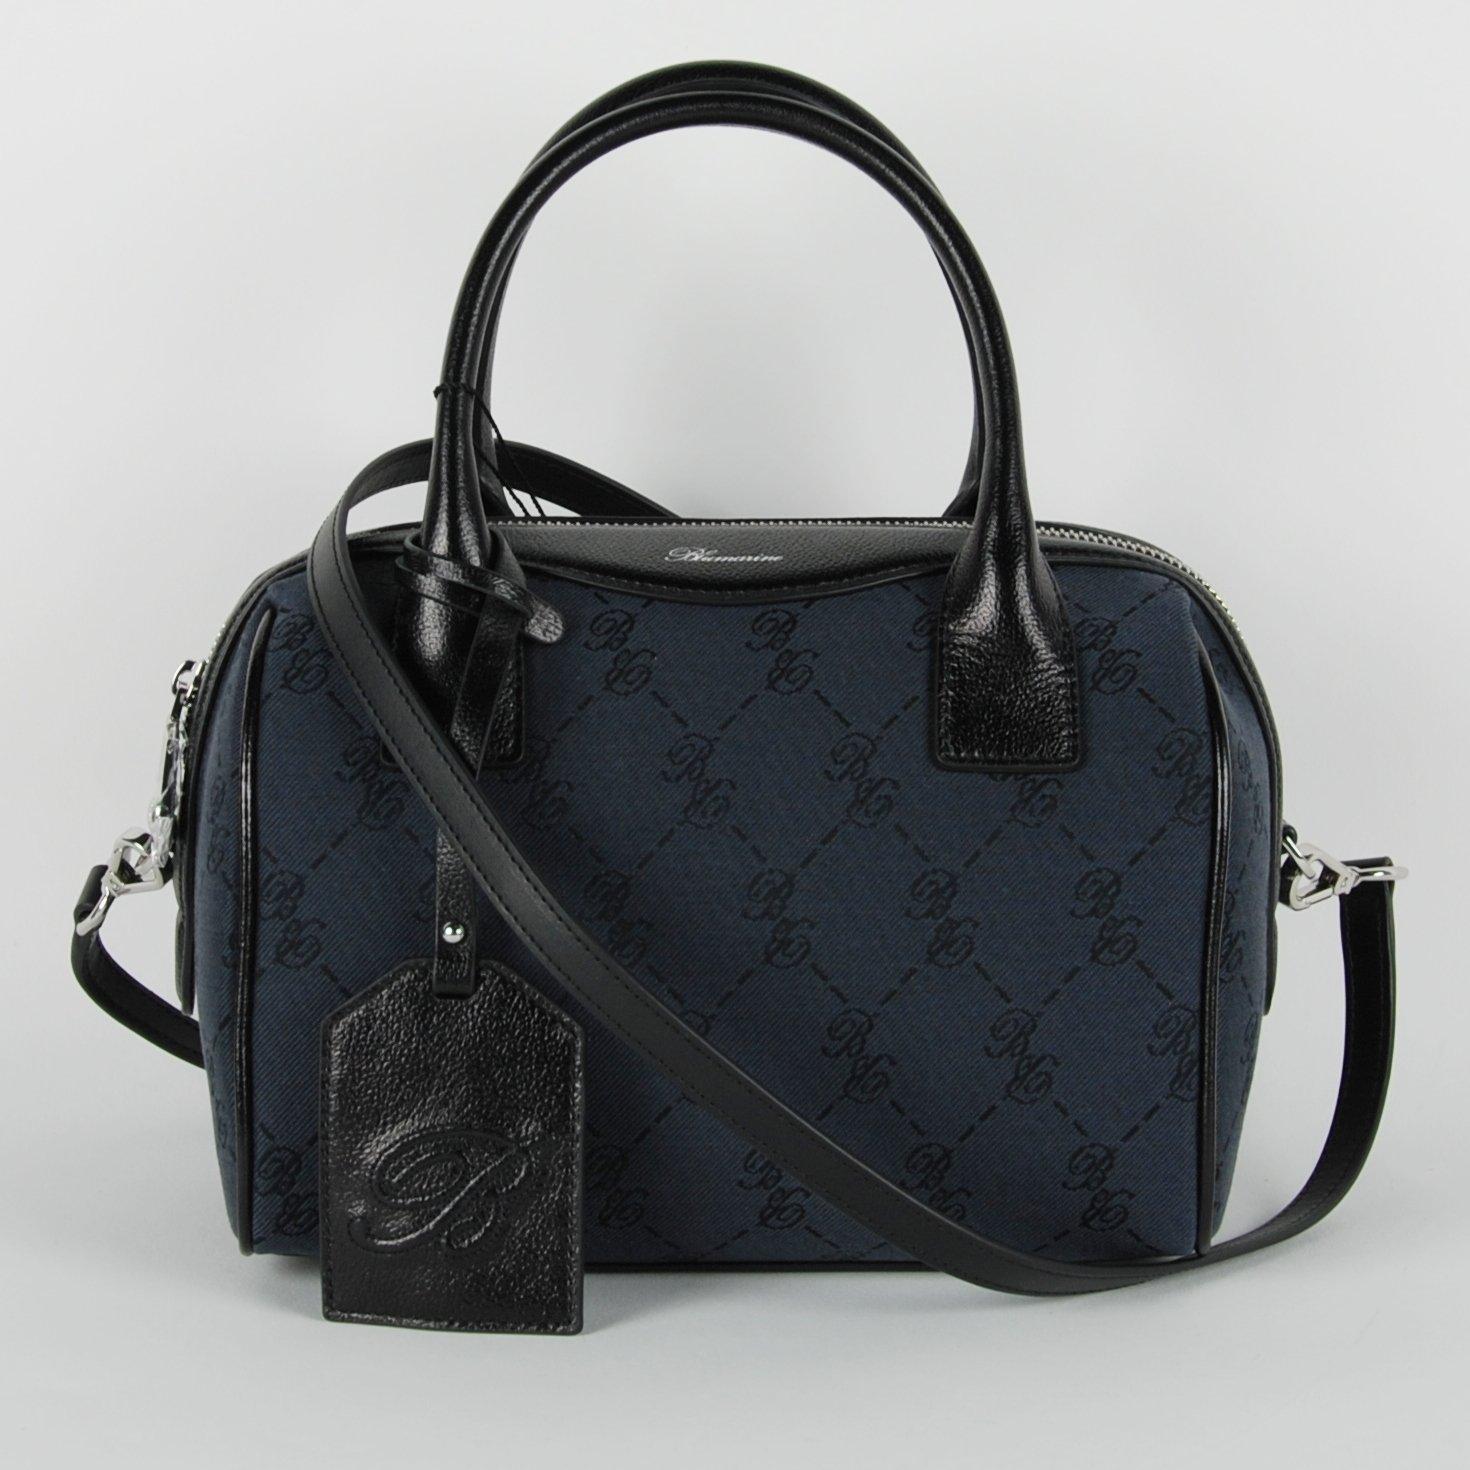 Blumarine Women's Bowling Bag Black BL1421465